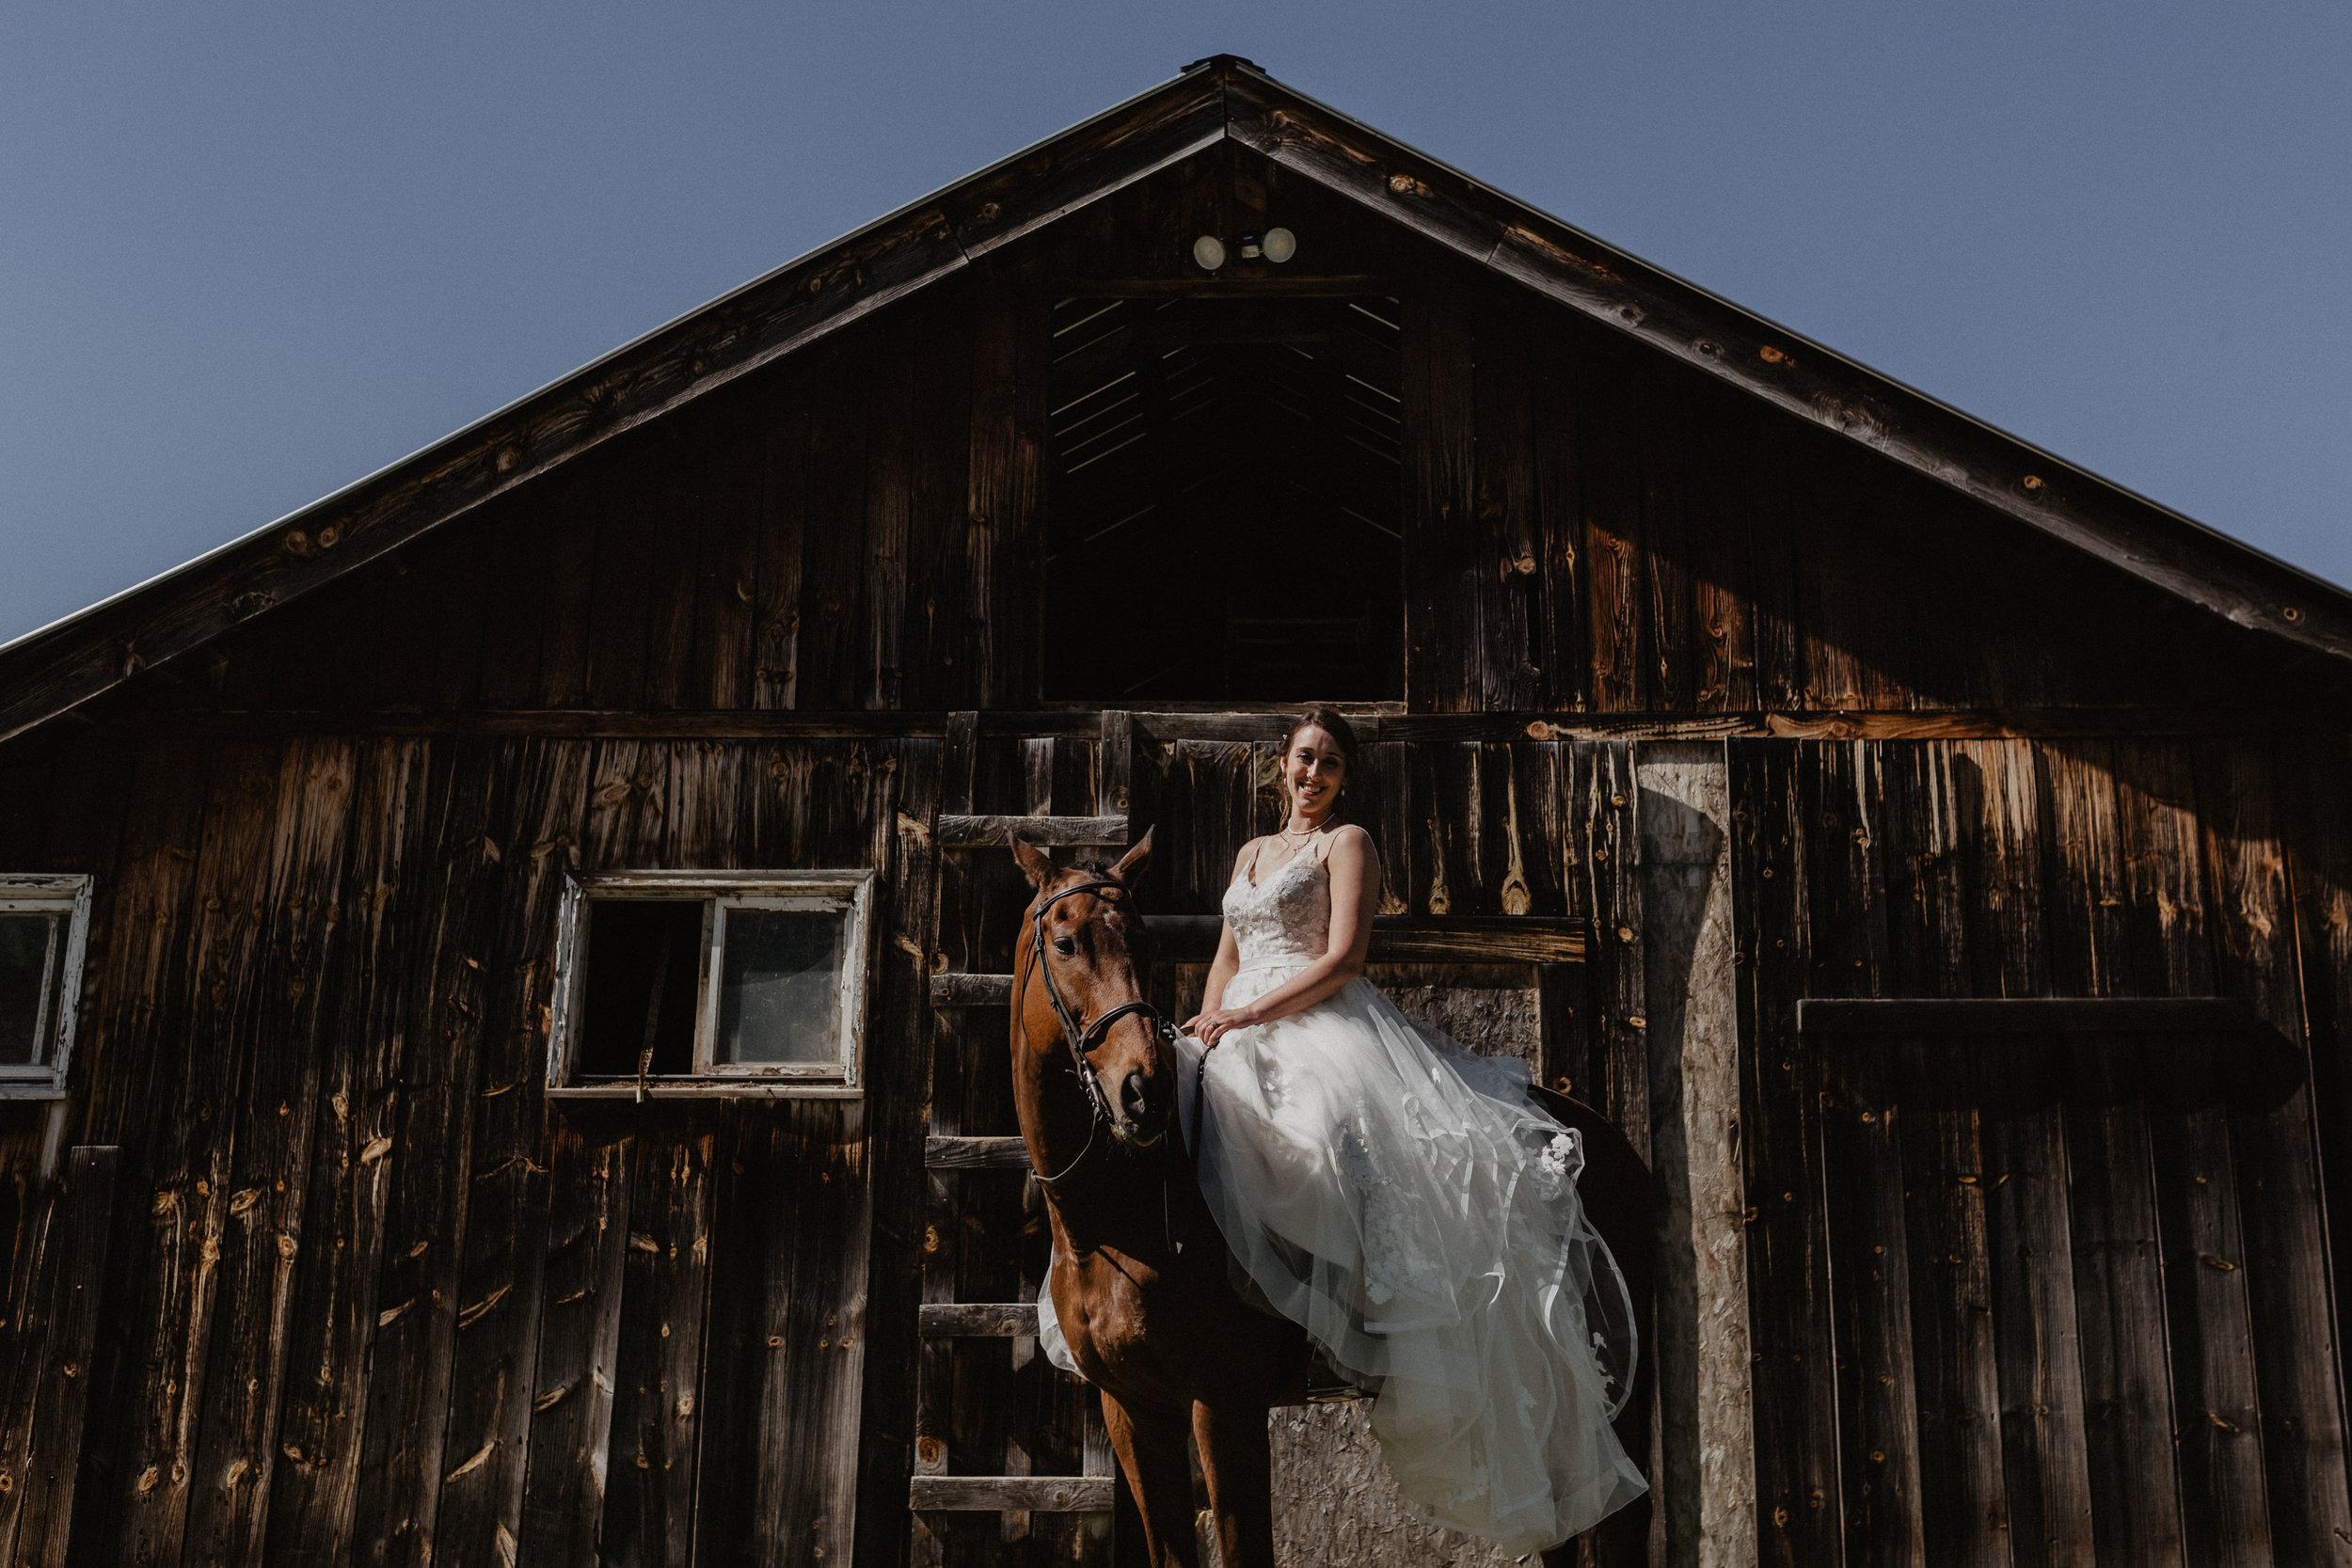 upstate_ny_wedding-66.jpg